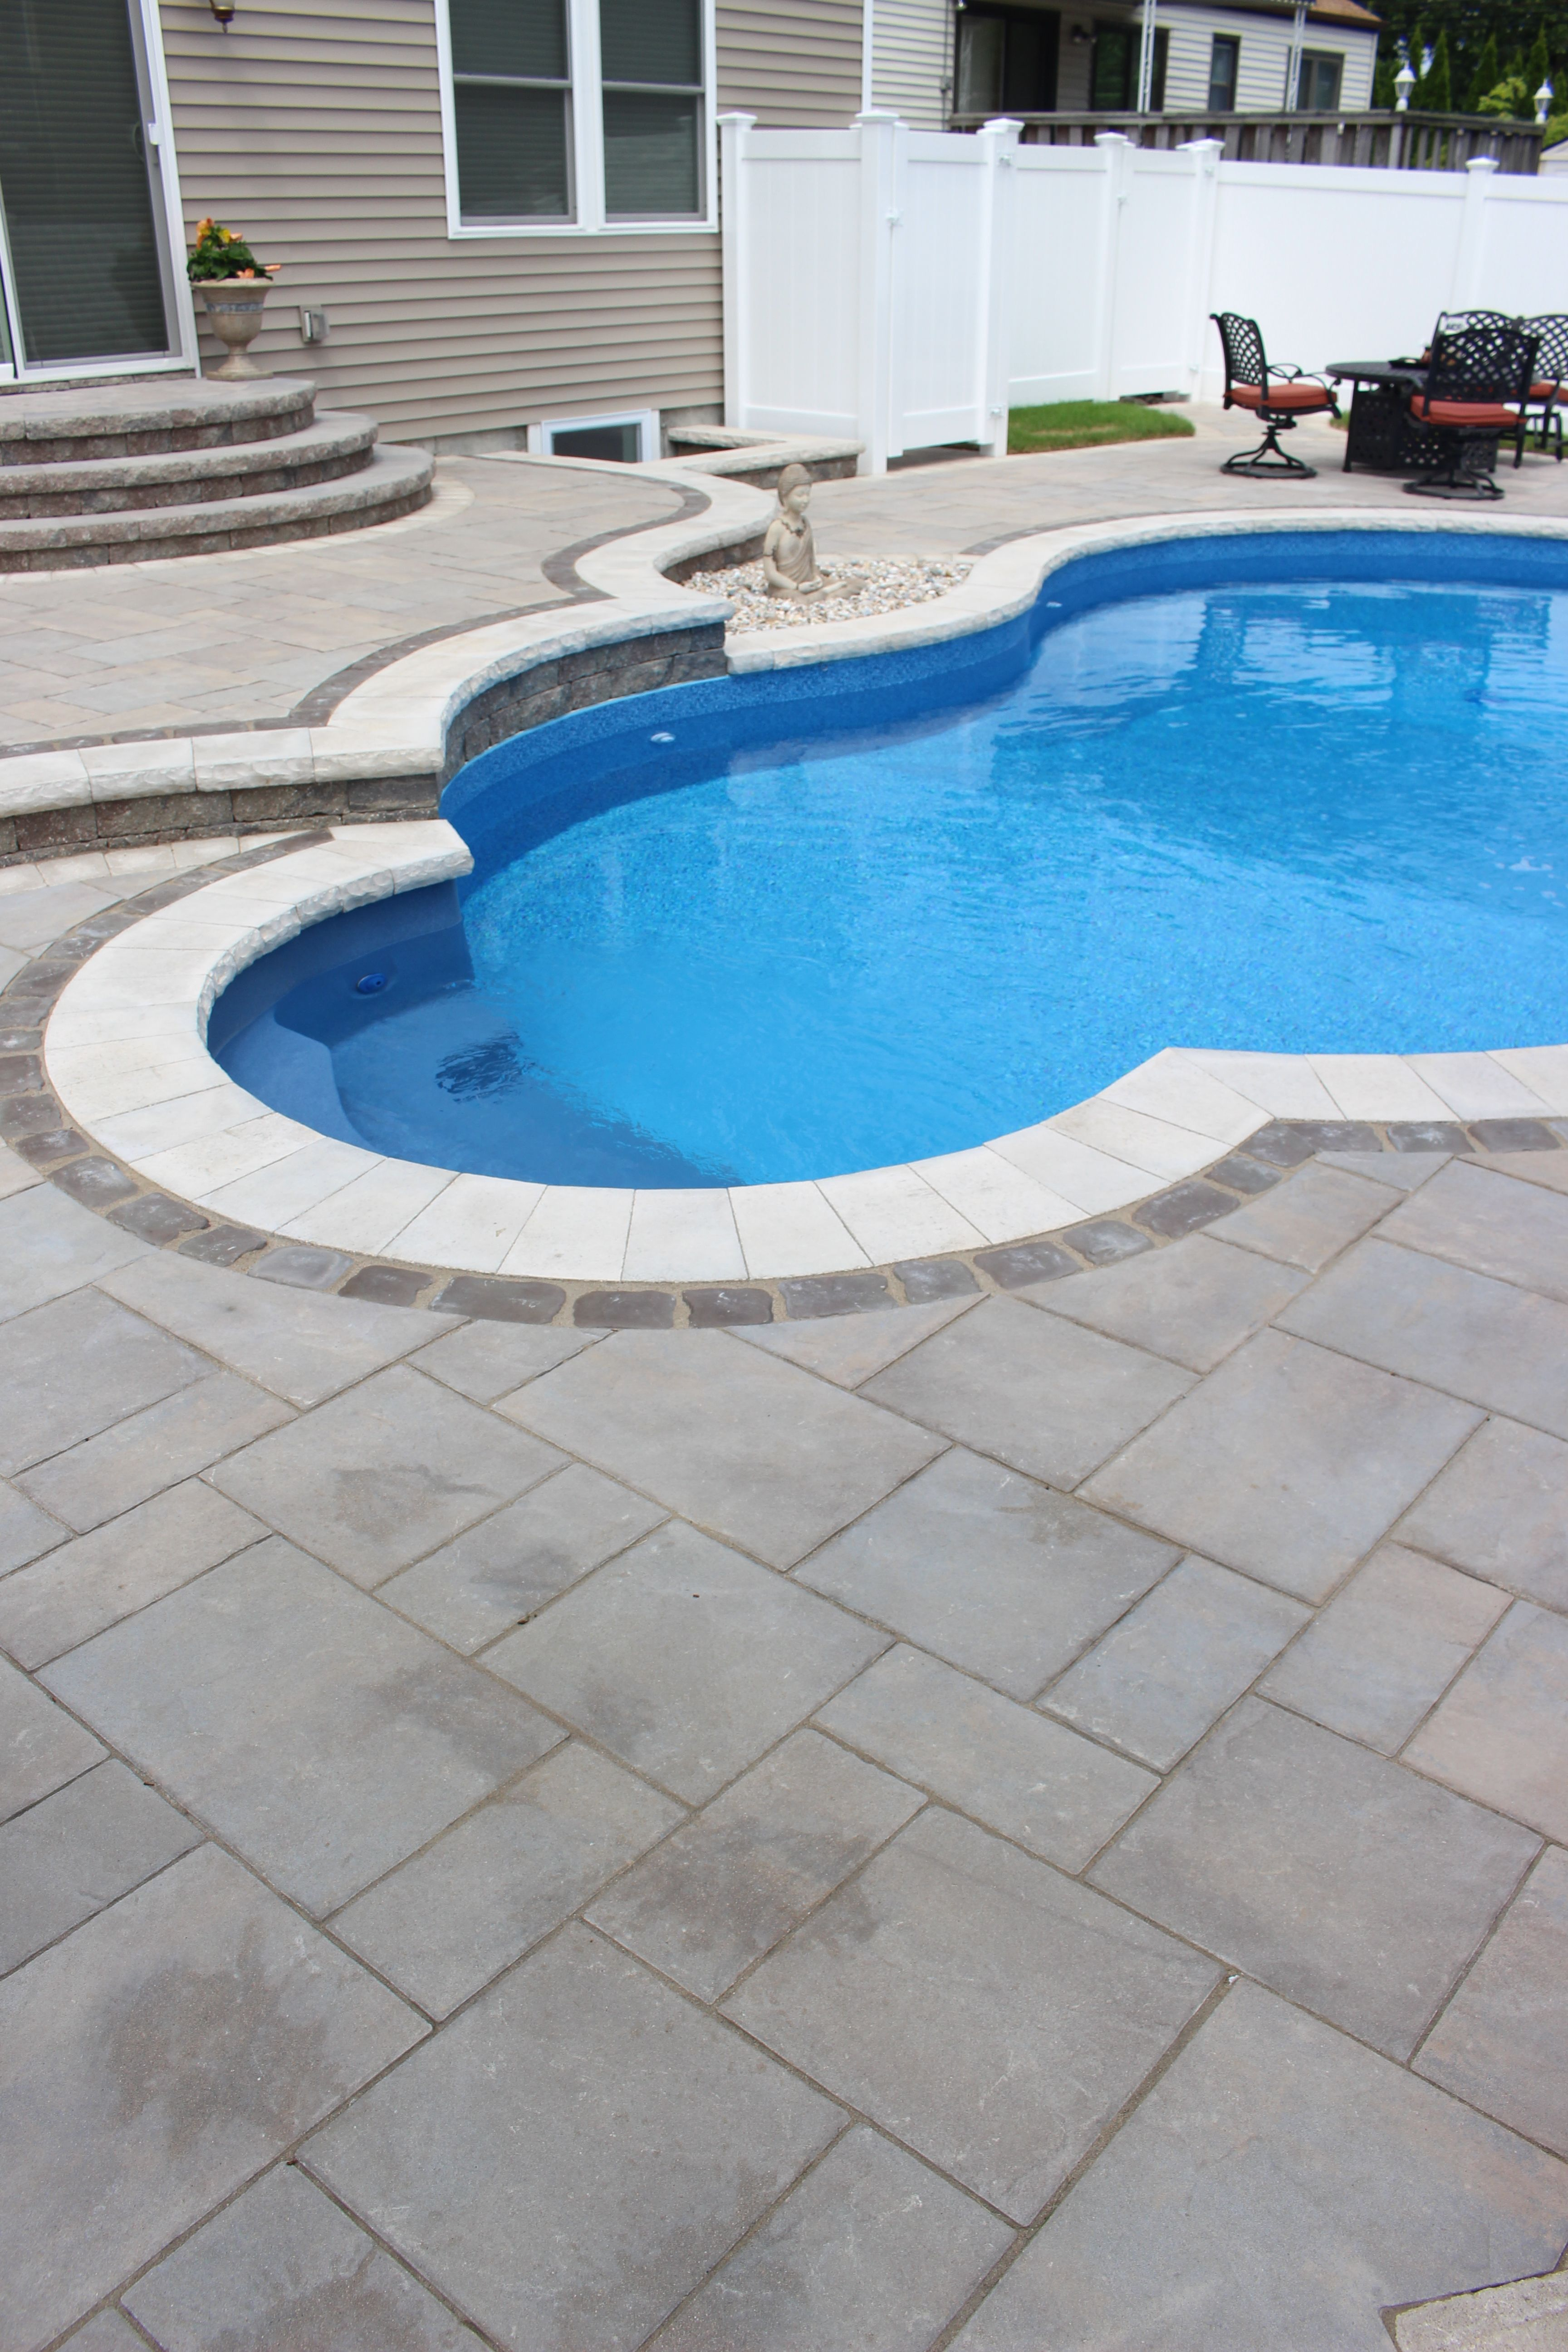 This Massapequa Ny Pool Patio Built With Beautiful Unilock Pavers Is Clean And Modern Yet Wonderfully Organic Thank Pool Patio Pavers Pool Decks Pool Patio